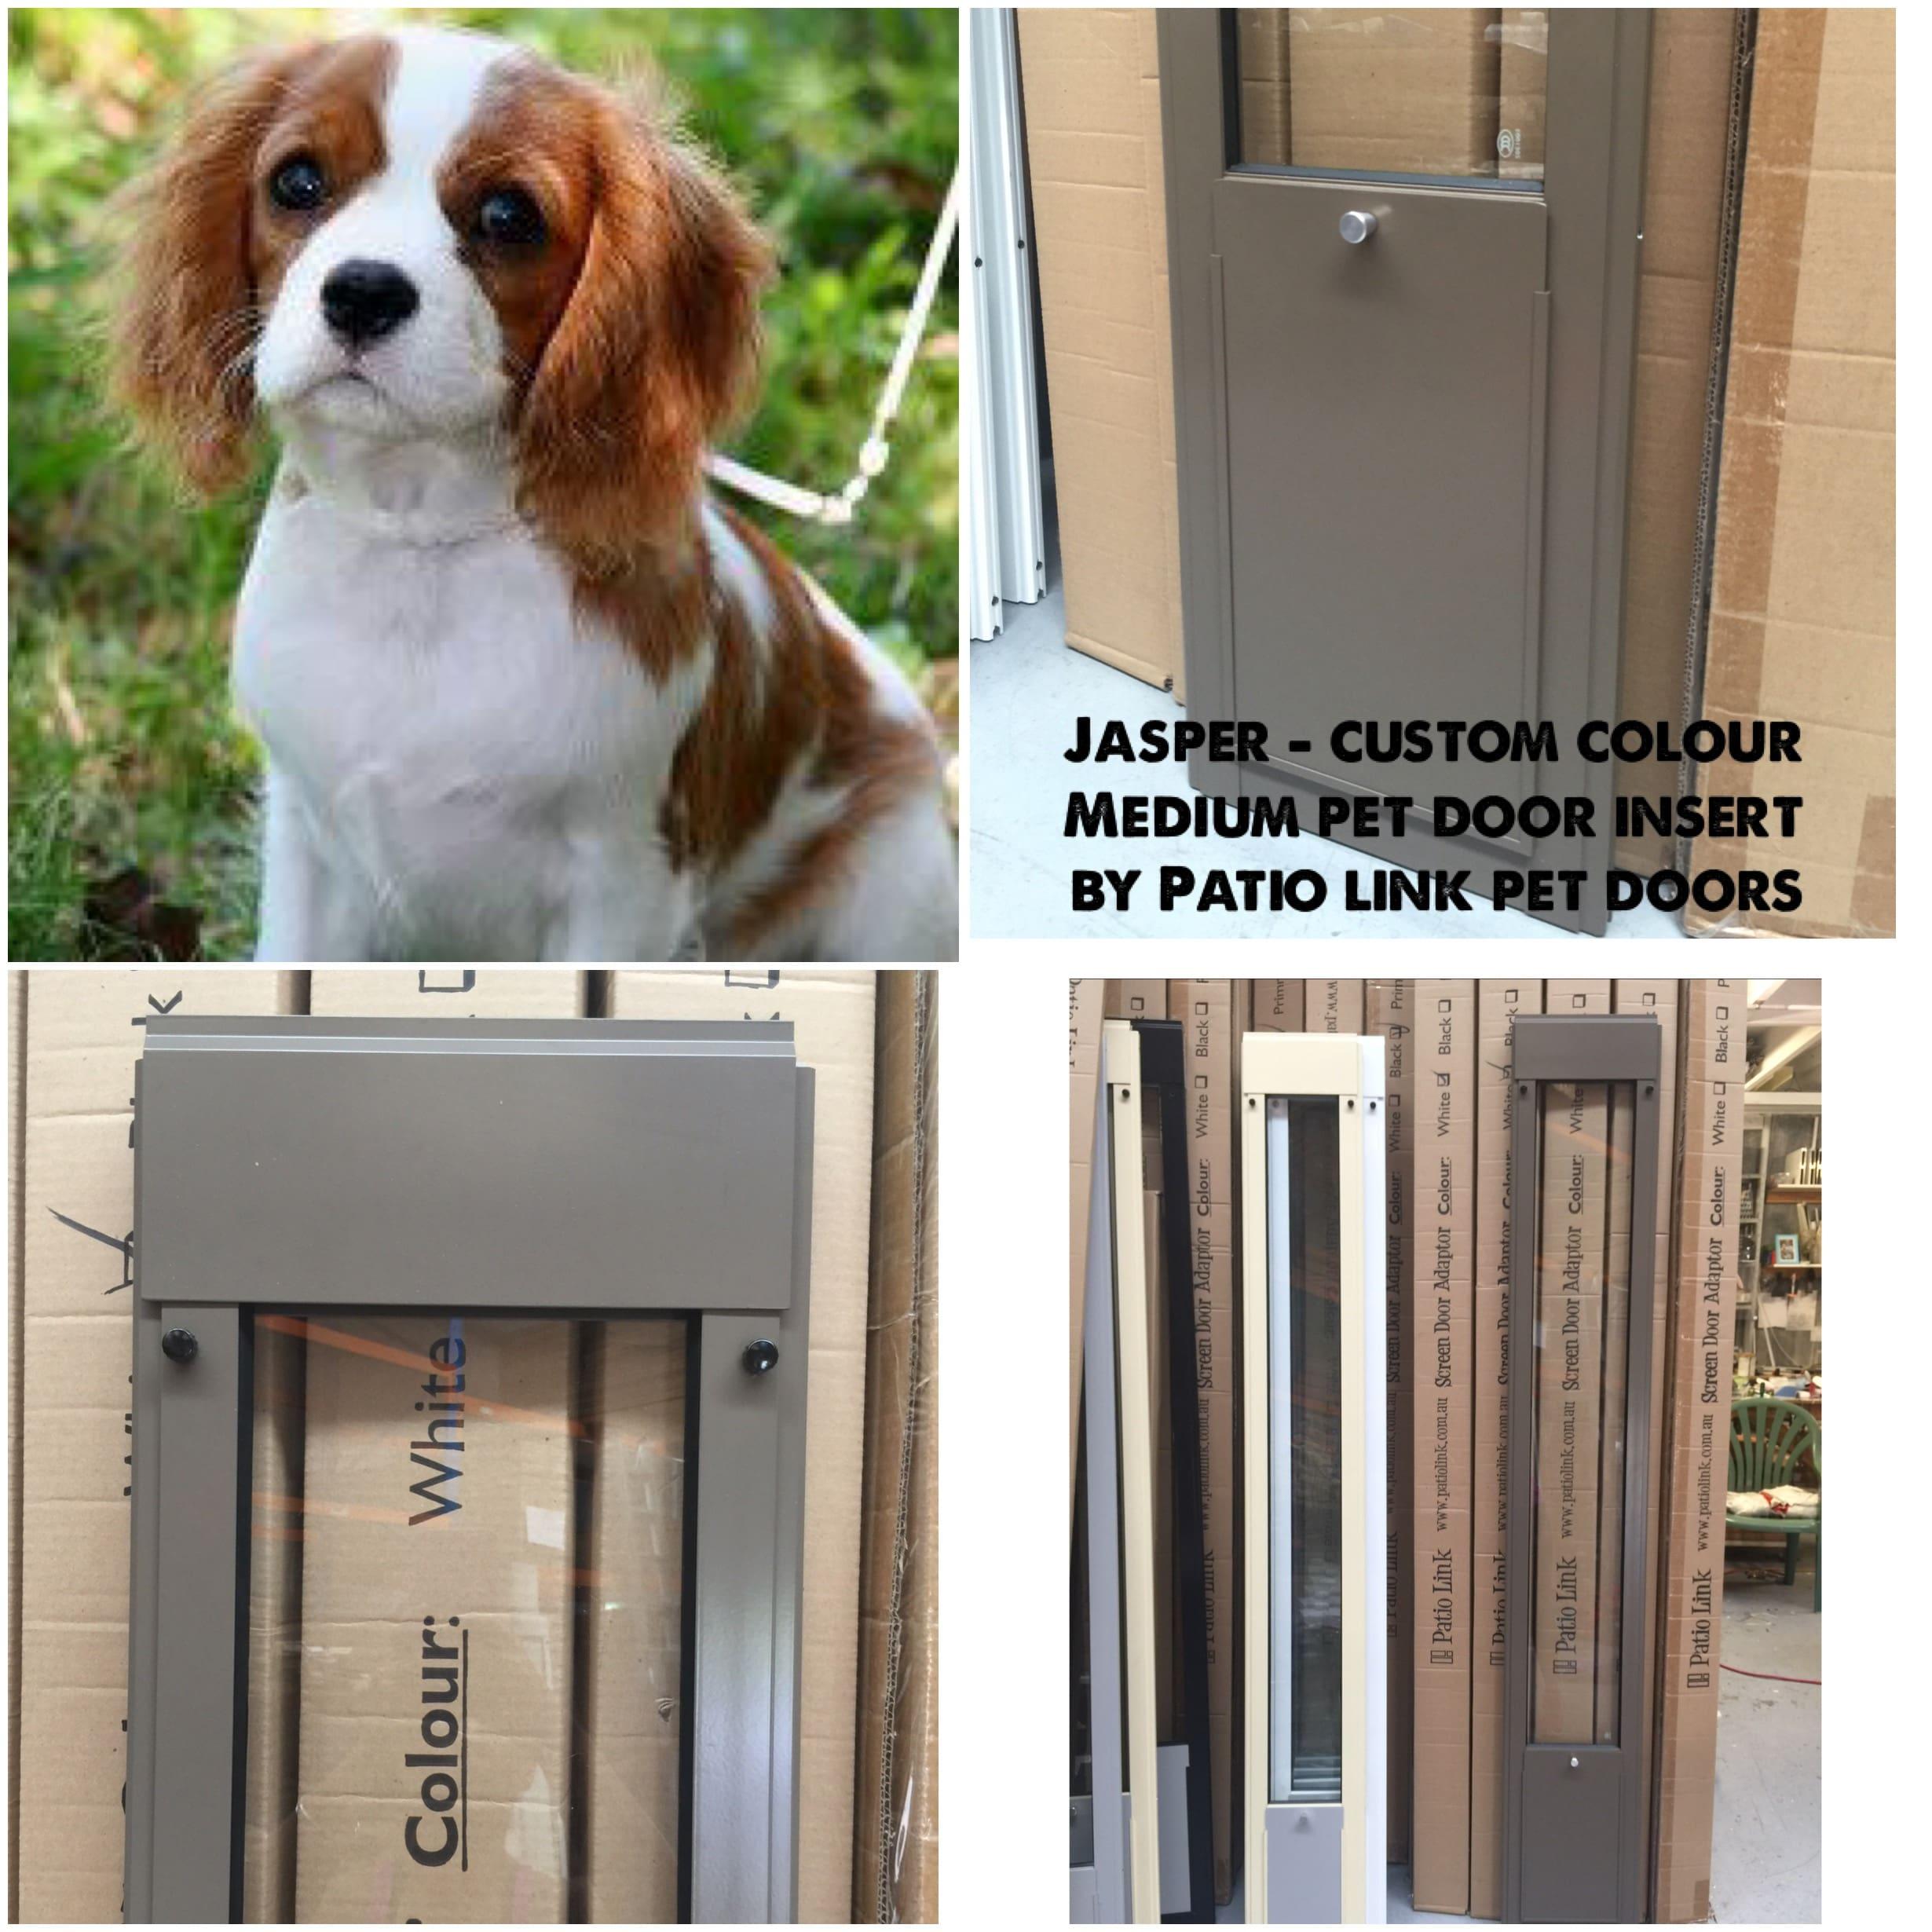 Jasper custom colour pet door insert